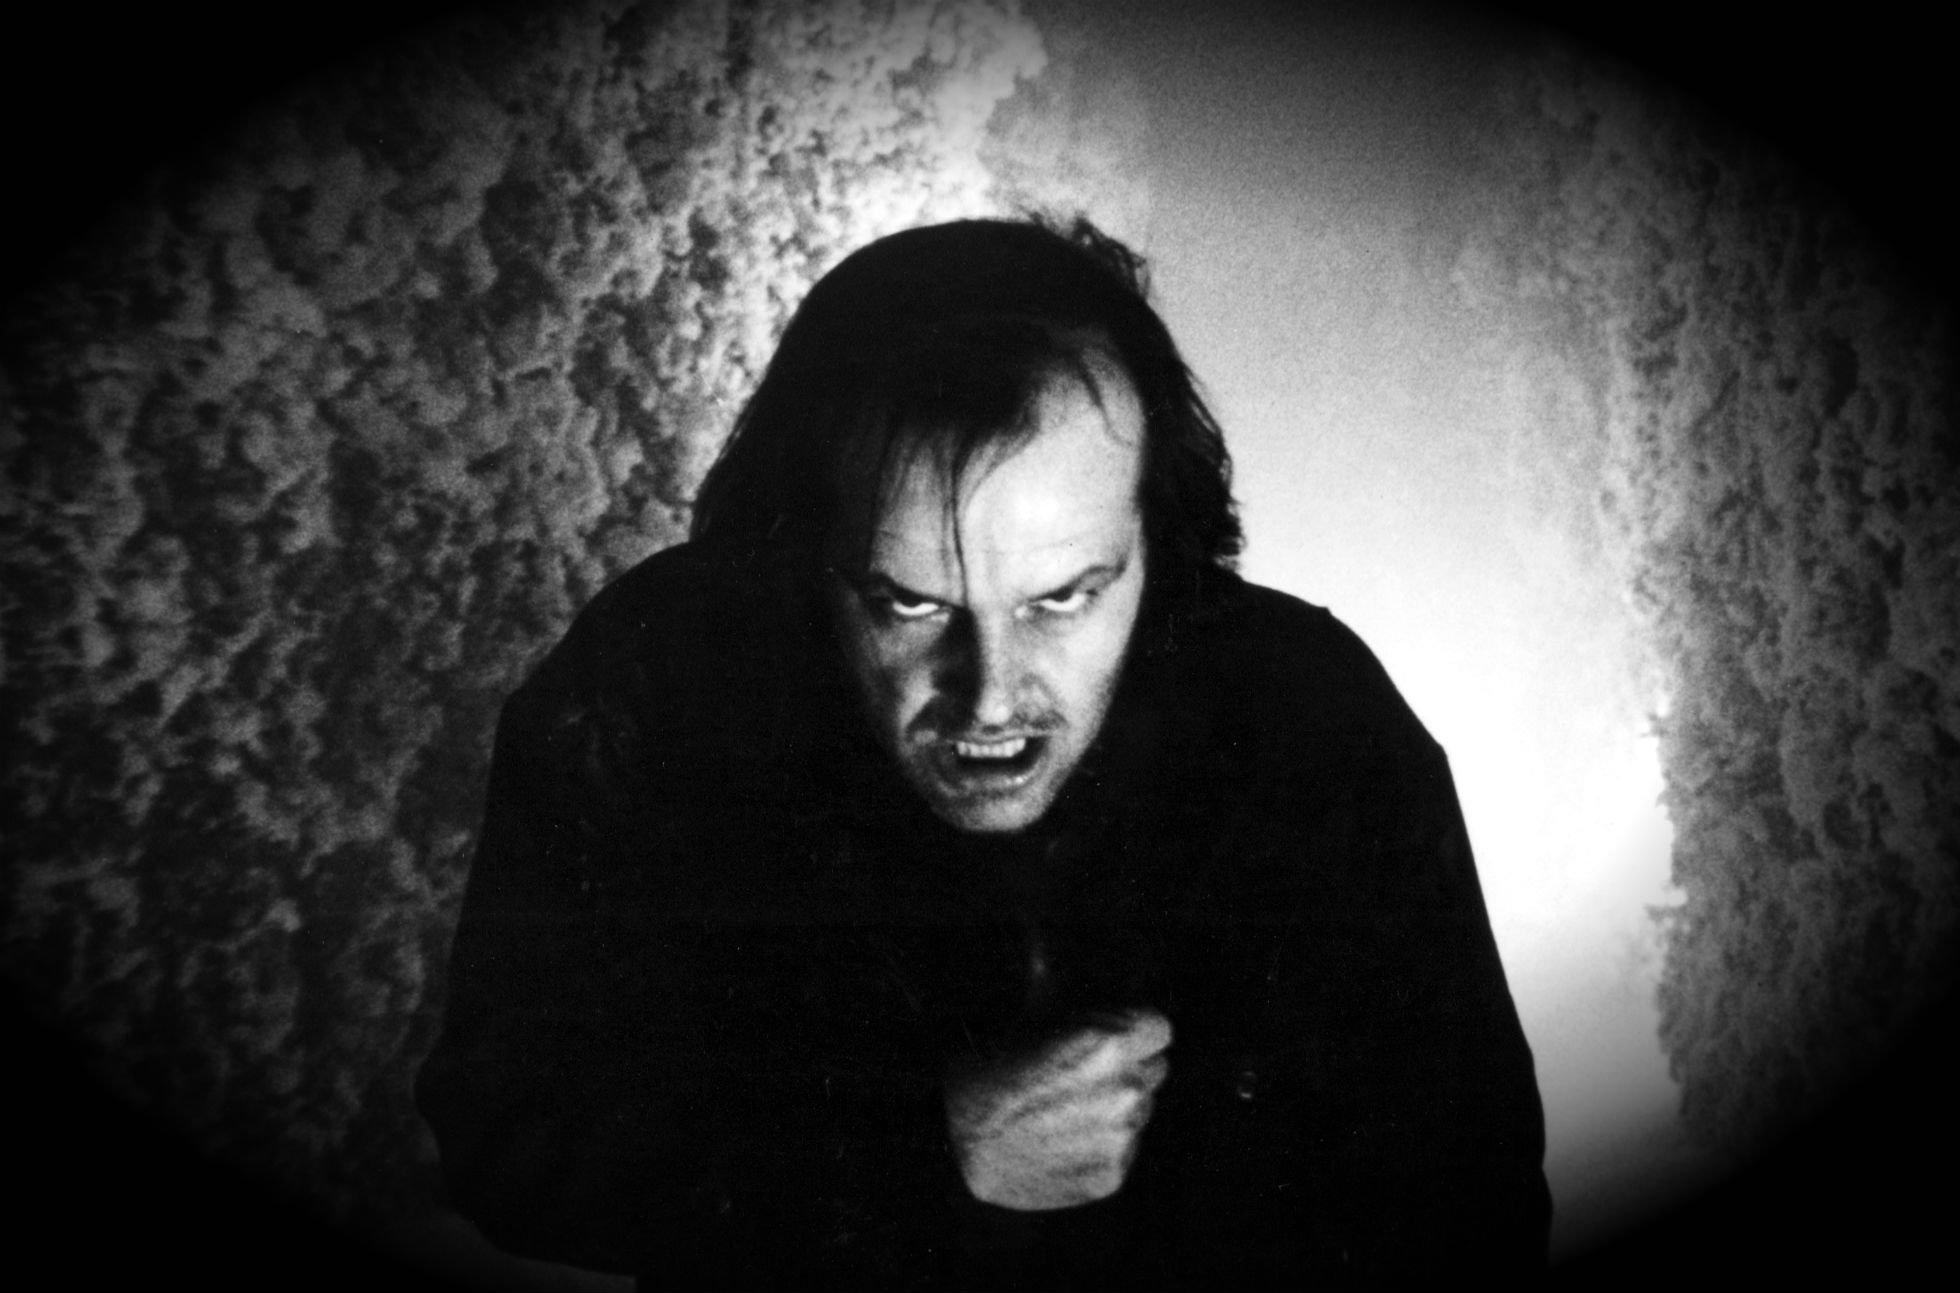 SHINING horror thriller dark movie film classic wallpaper background 1960x1293